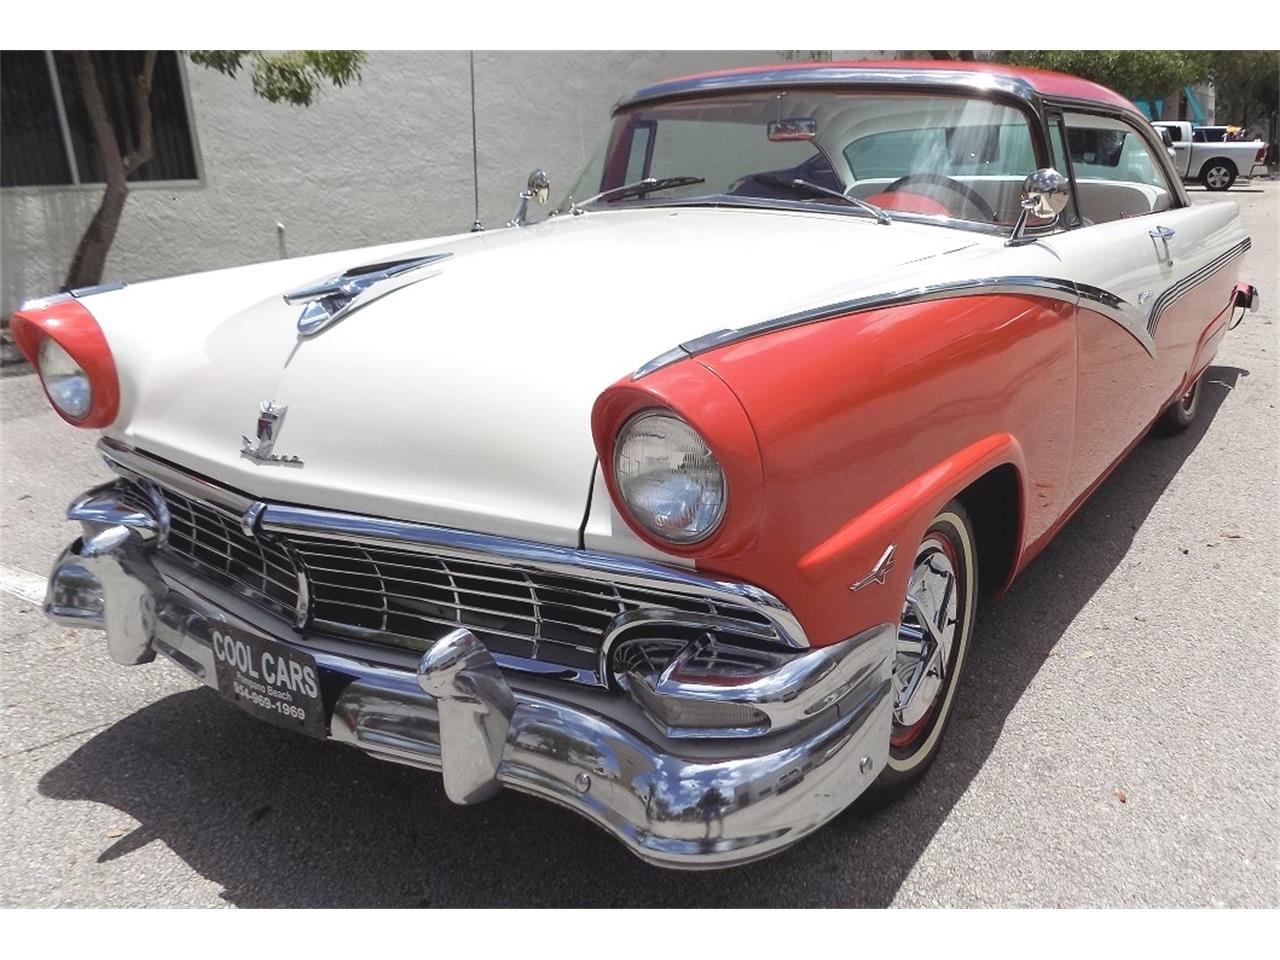 Large Picture of Classic '56 Victoria located in POMPANO BEACH Florida - $25,500.00 - LHFB